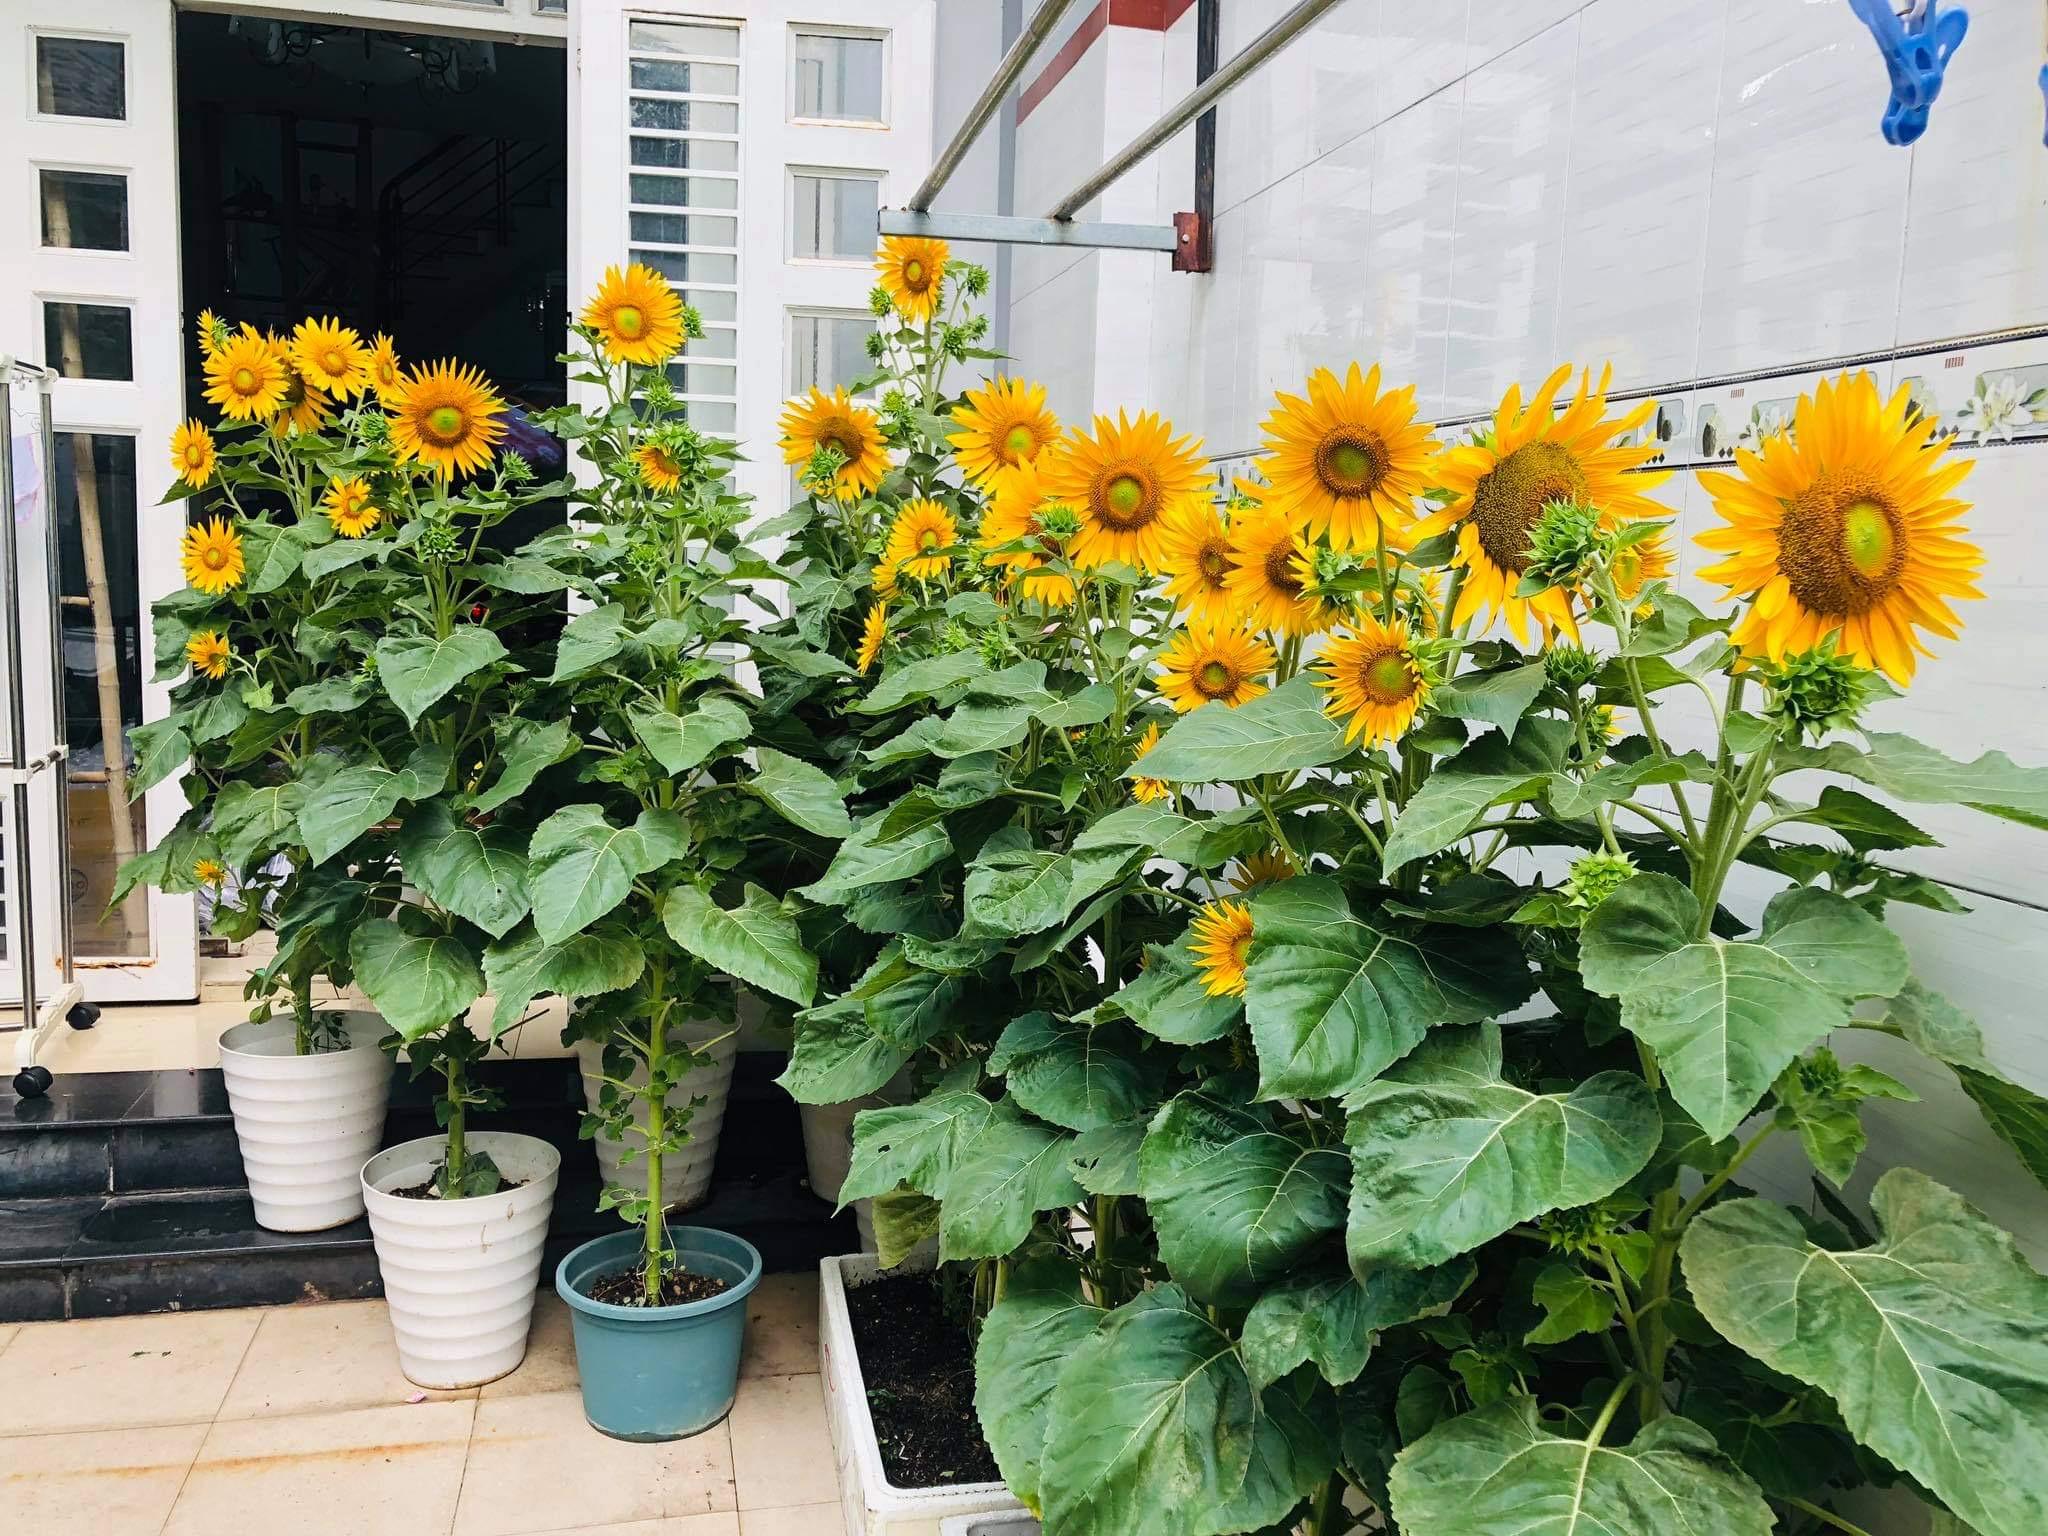 Saigon mother finds peace, not profit, in urban garden